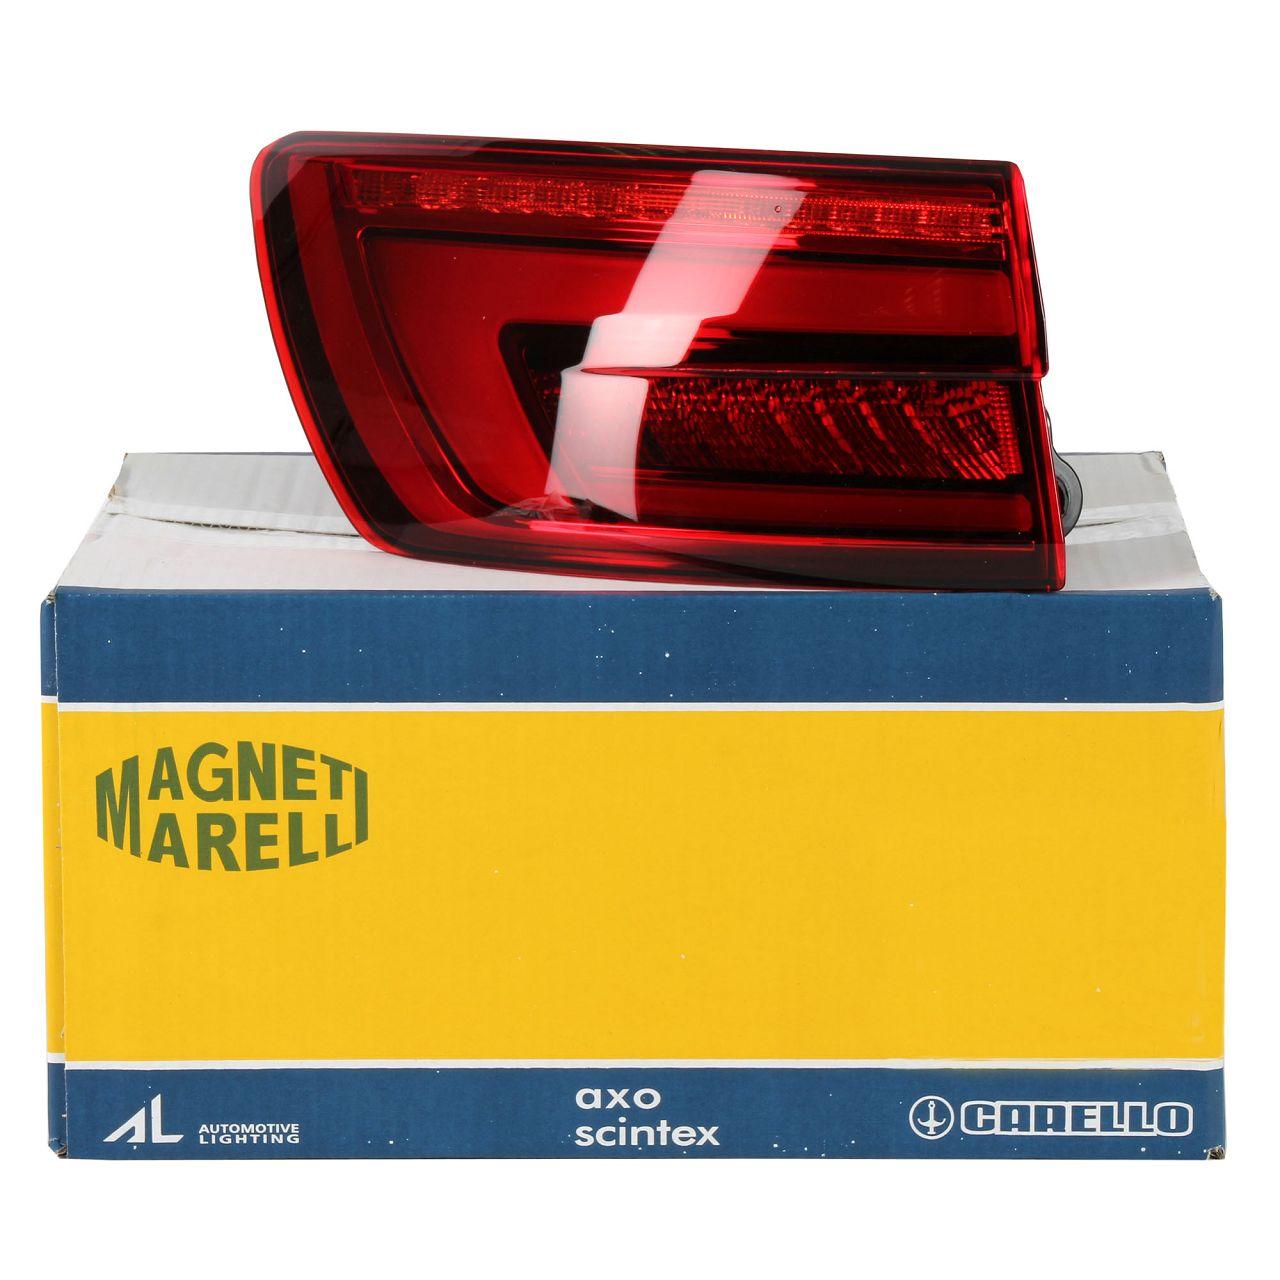 MAGNETI MARELLI Heckleuchte LED für AUDI A4 AVANT (8W5 B9) AUSSEN LINKS